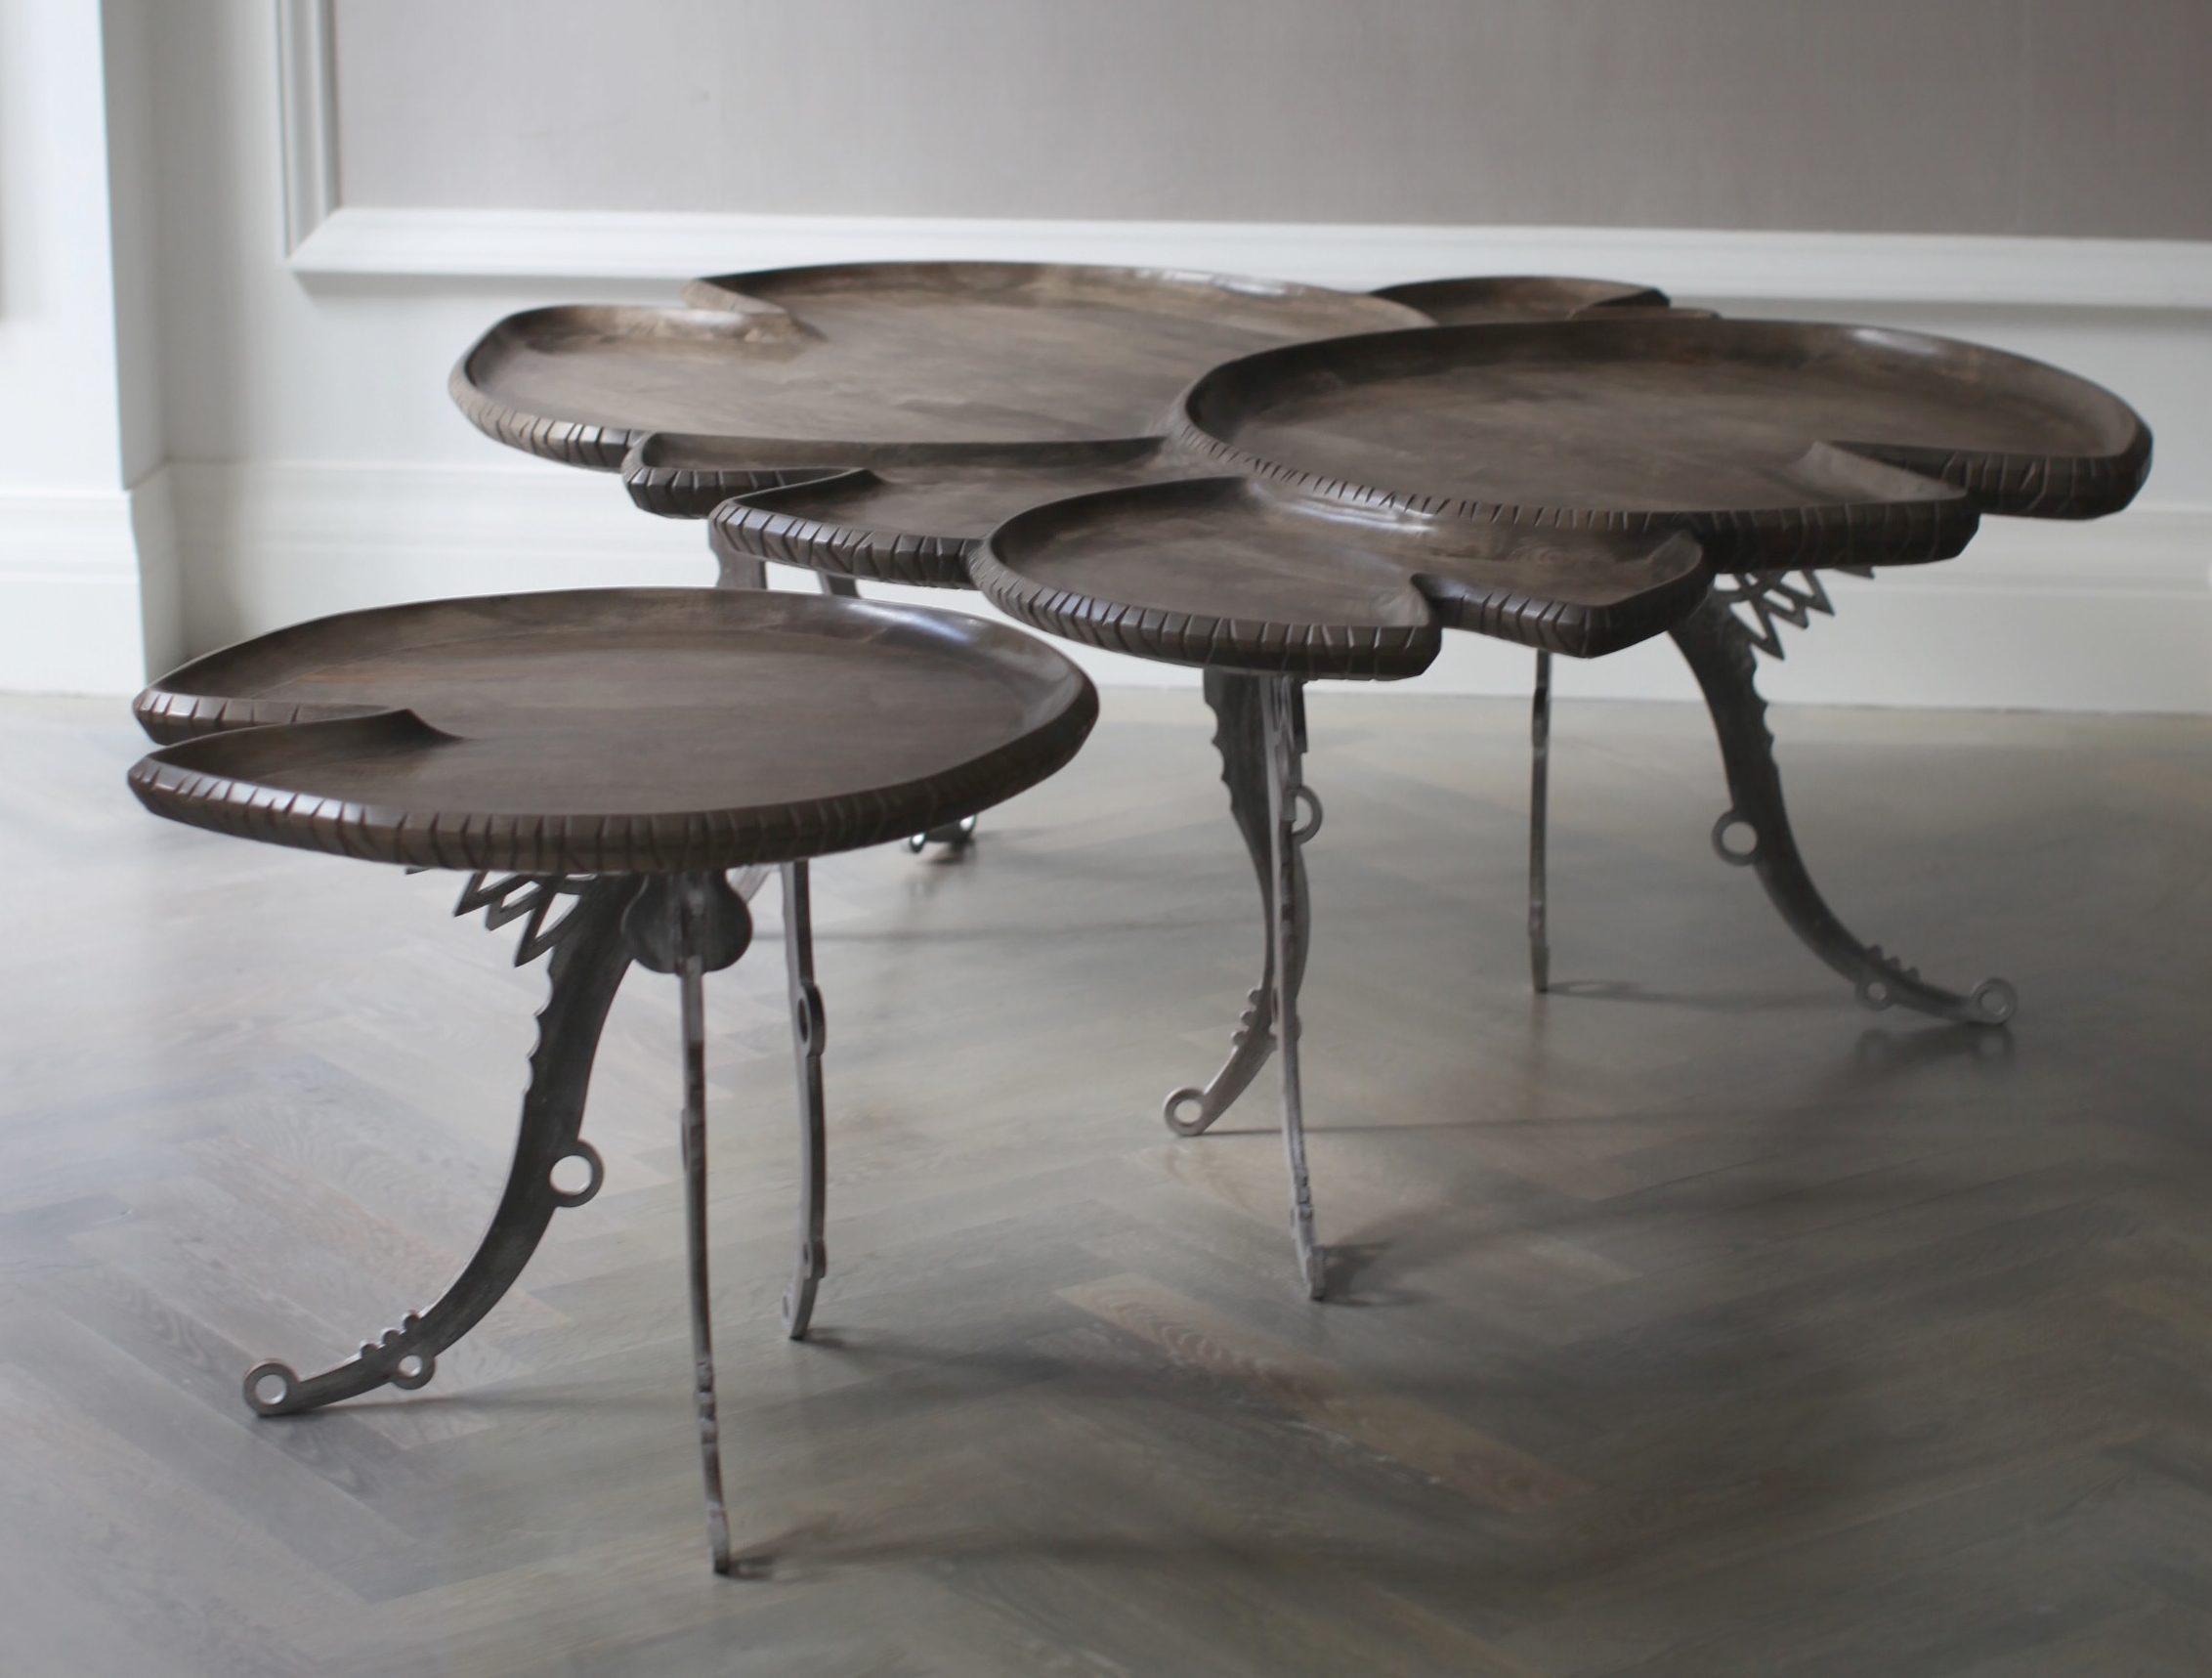 Louis Henri Ltd - Lilly Pad Table